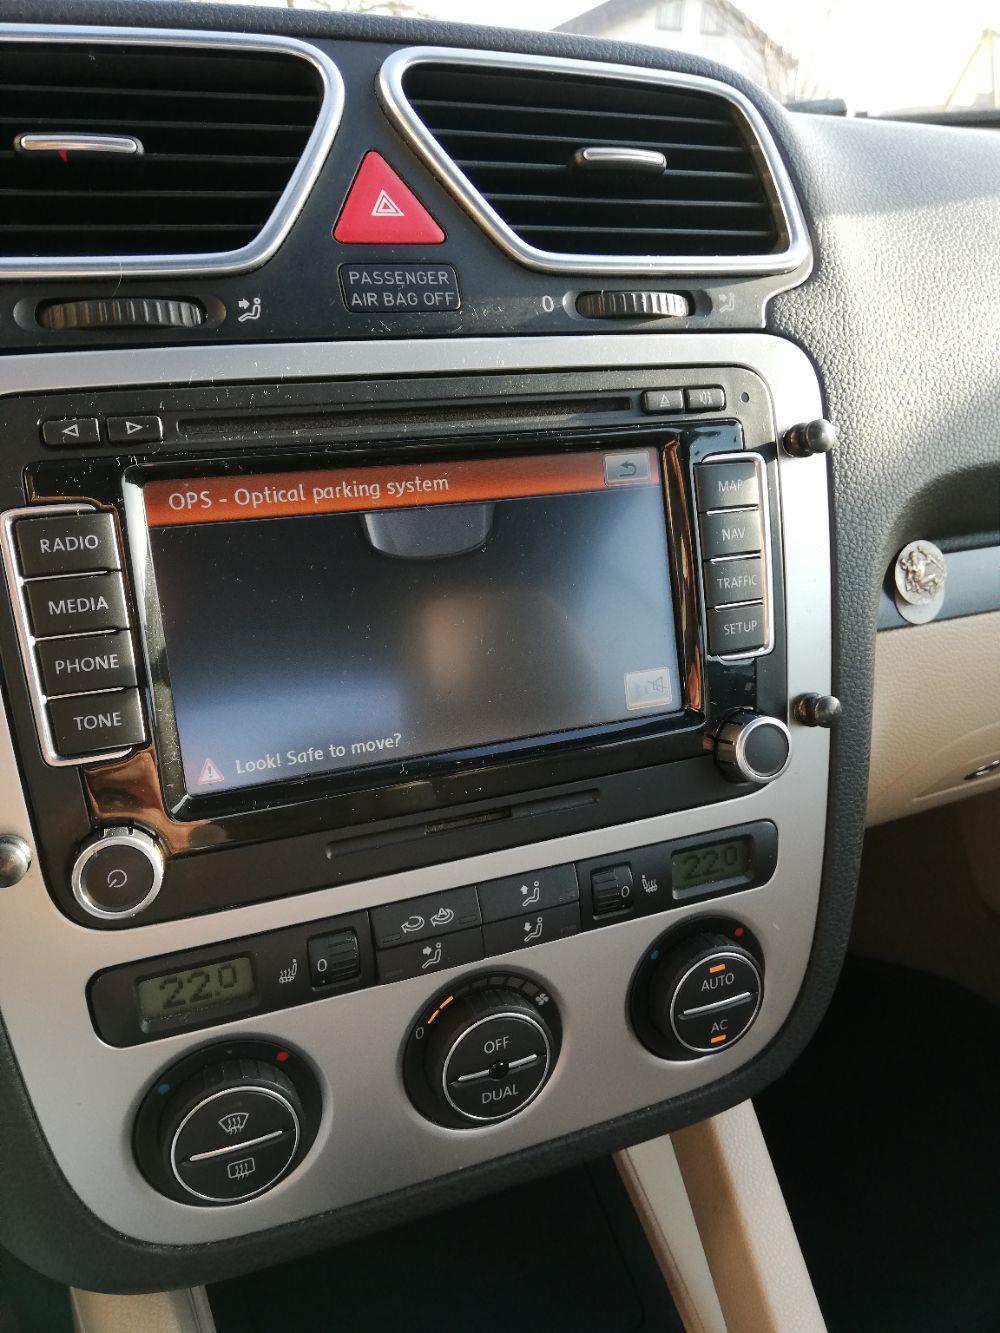 VW Eos 2.0 TDI HIGHLINE  - imagine 8